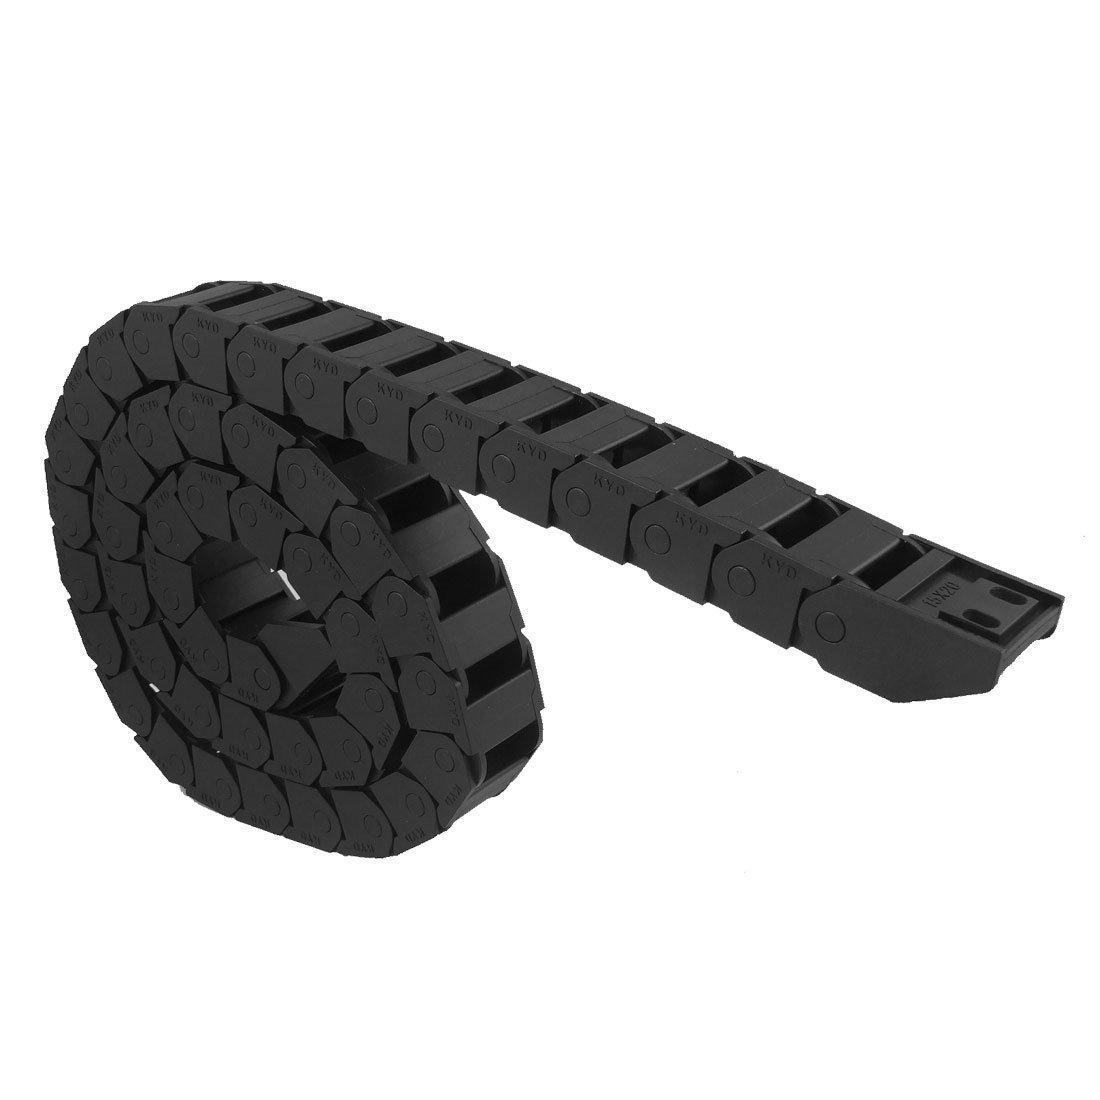 Cadena de arrastre - TOOGOO(R)Cable de remolque Cadena de arrastre de plastico de maquinas herramientas Negro 15 x 20 mm SPHAGT48734